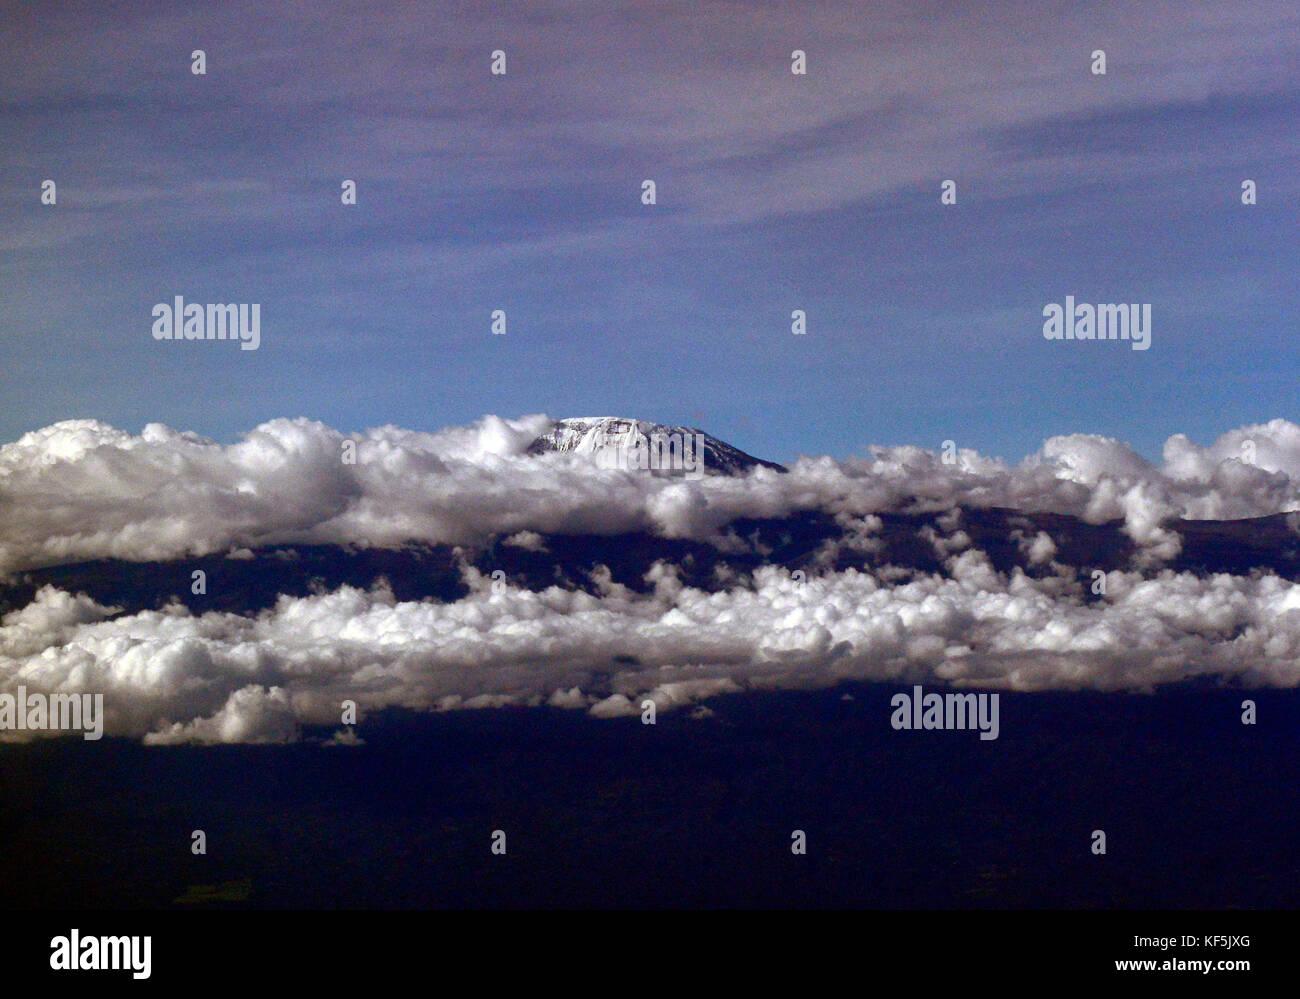 Mount Kilimanjaro peeking above the clouds. - Stock Image